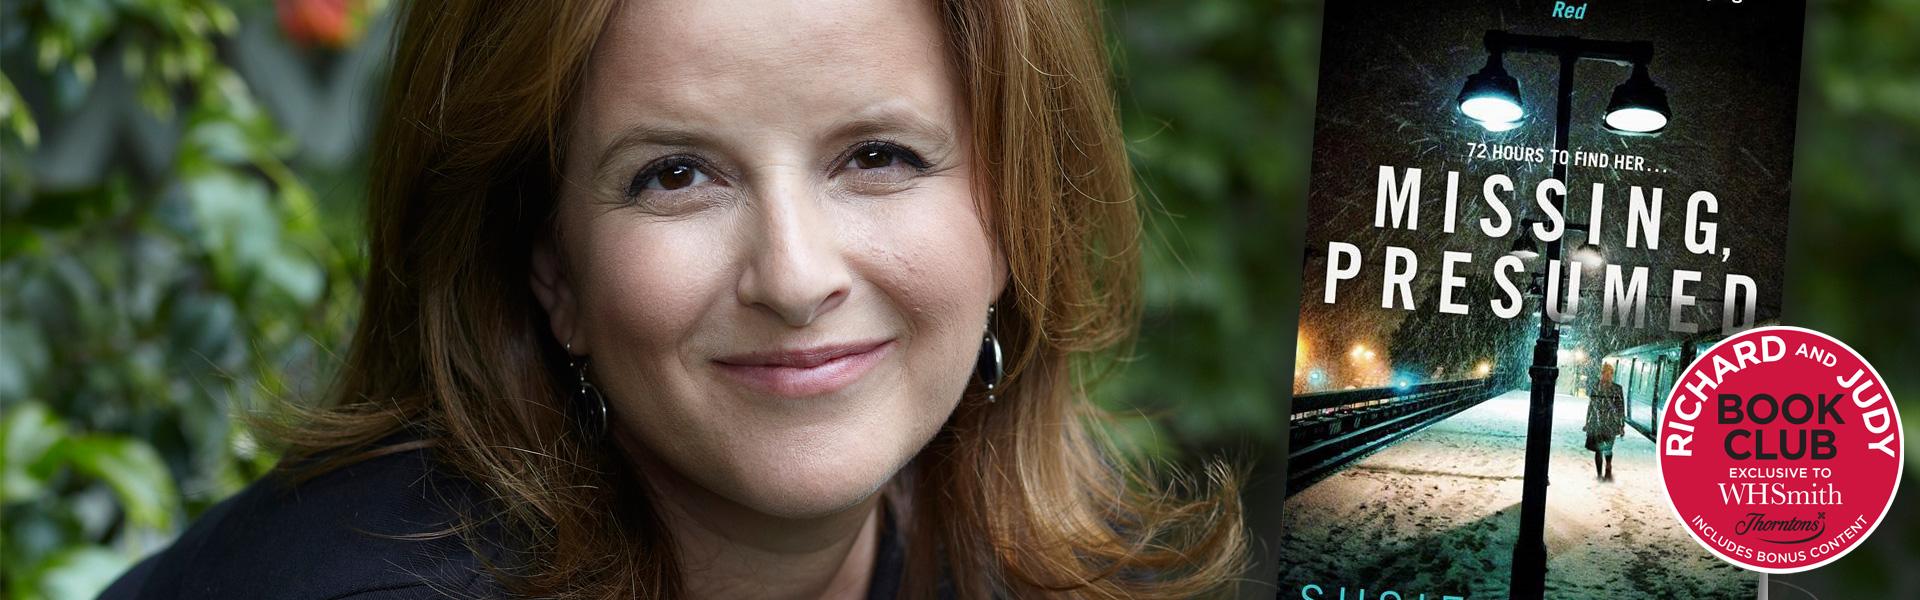 Richard and Judy Interview: Susie Steiner on Missing, Presumed